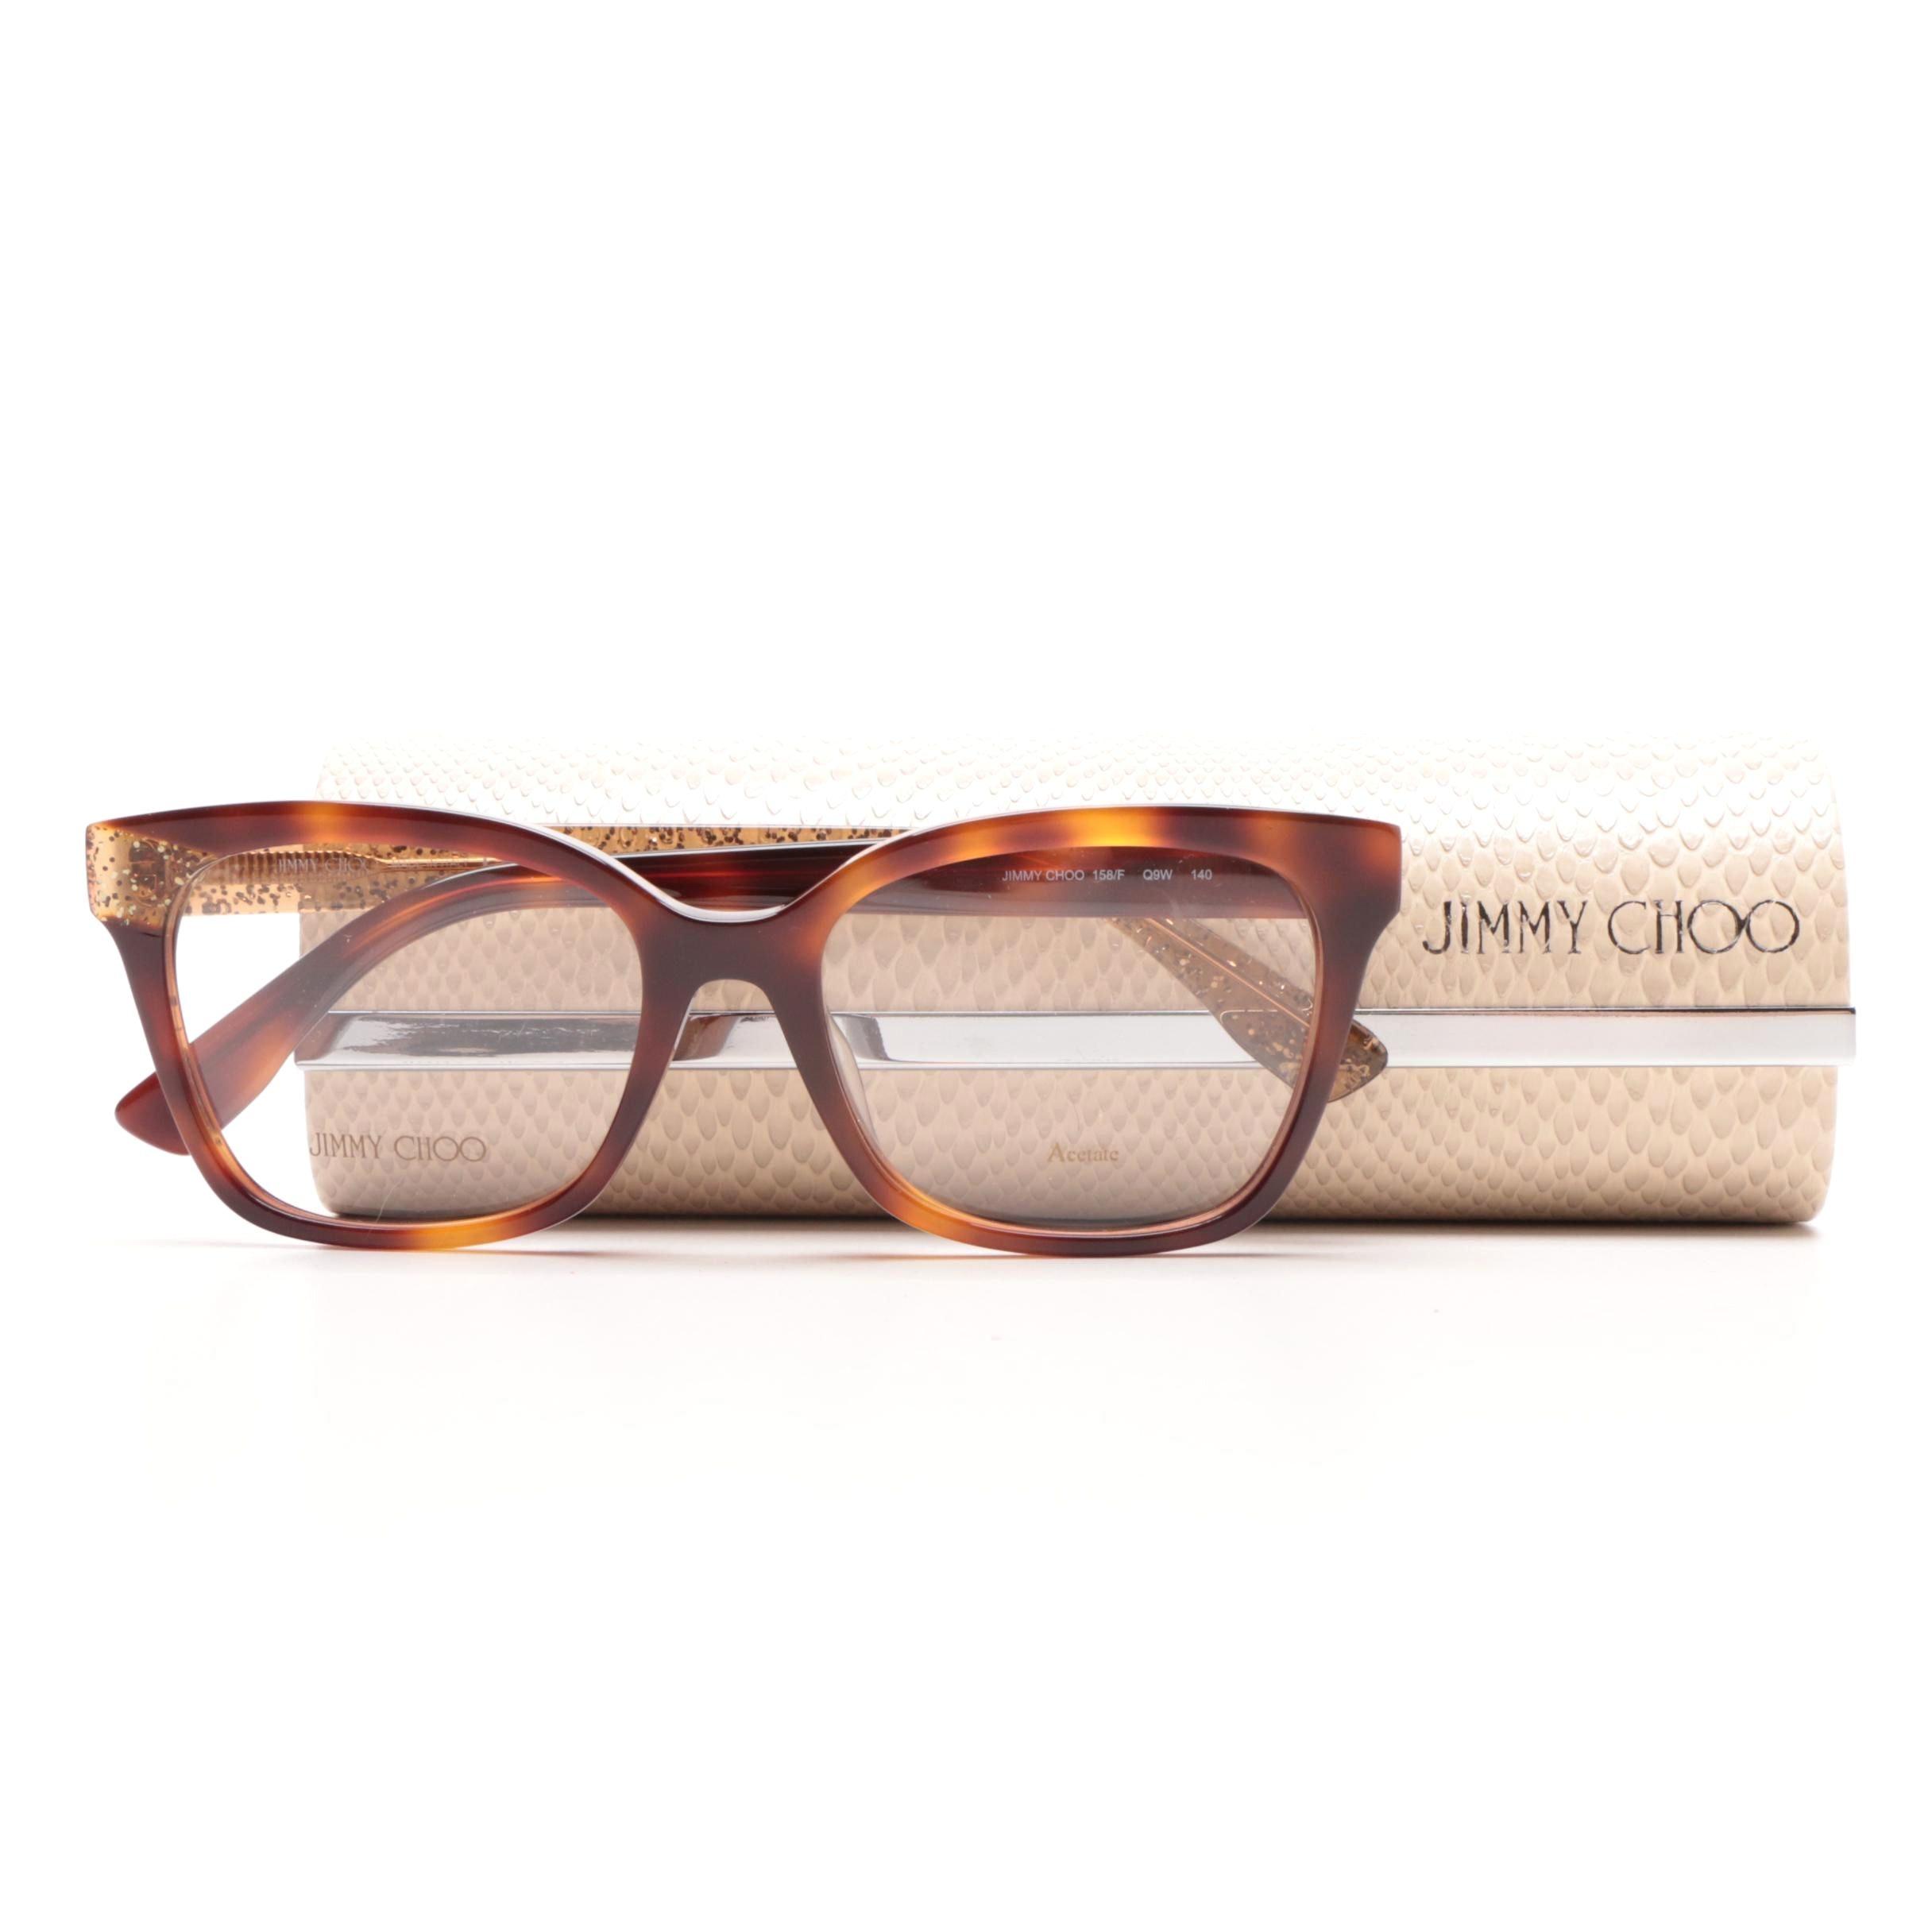 Jimmy Choo Designer Eyeglasses